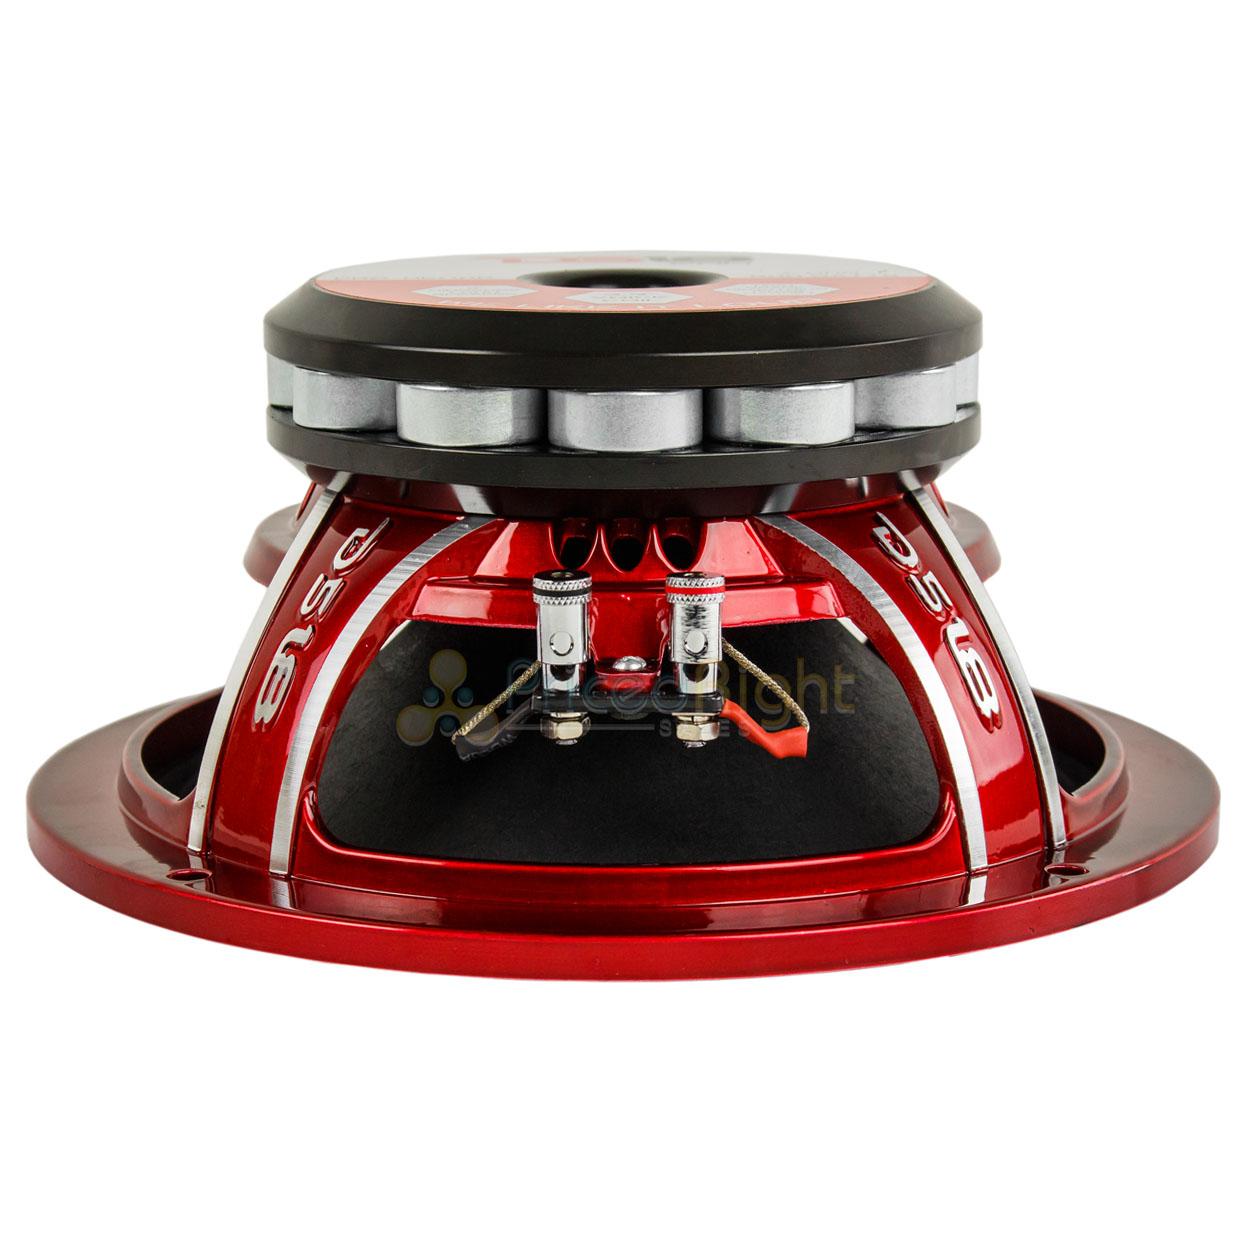 Ds18 8 U0026quot  Inch Midrange Speaker 800 Watts Max Power Pro